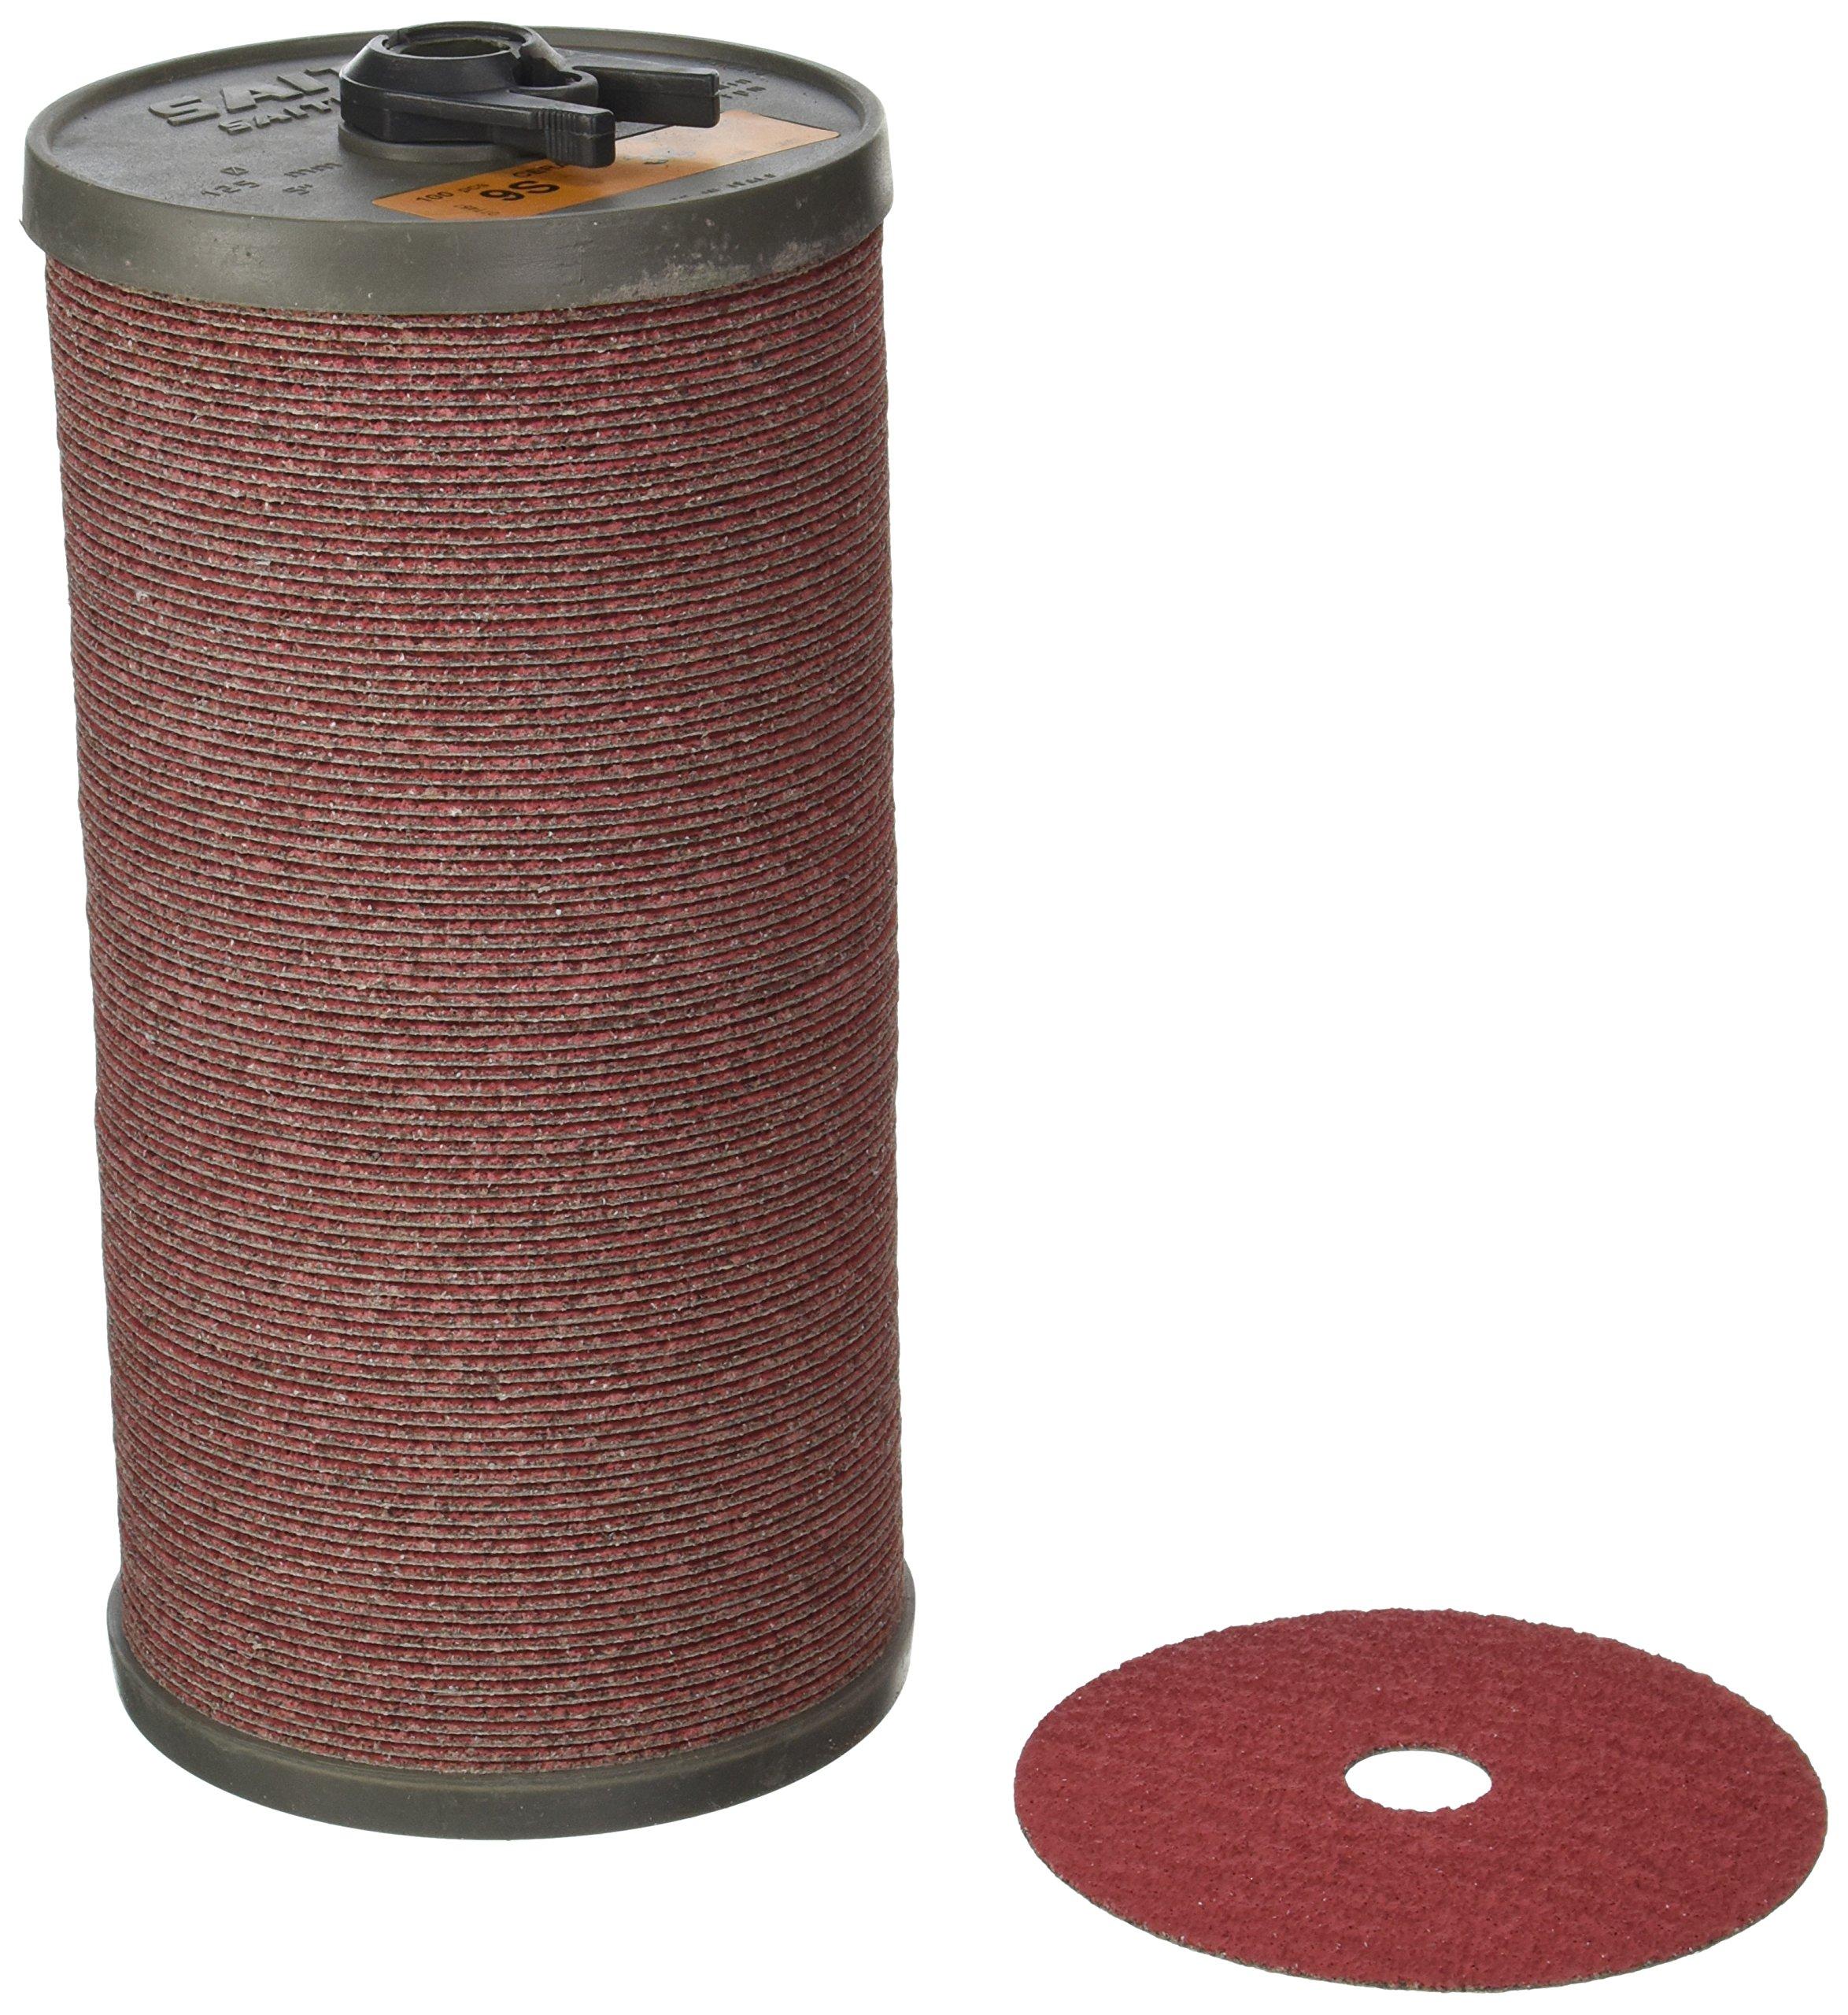 United Abrasives-SAIT 51353 SAIT Fiber Disc, 9S 5 X 7/8 36X Bulk Disc, 100 Pack